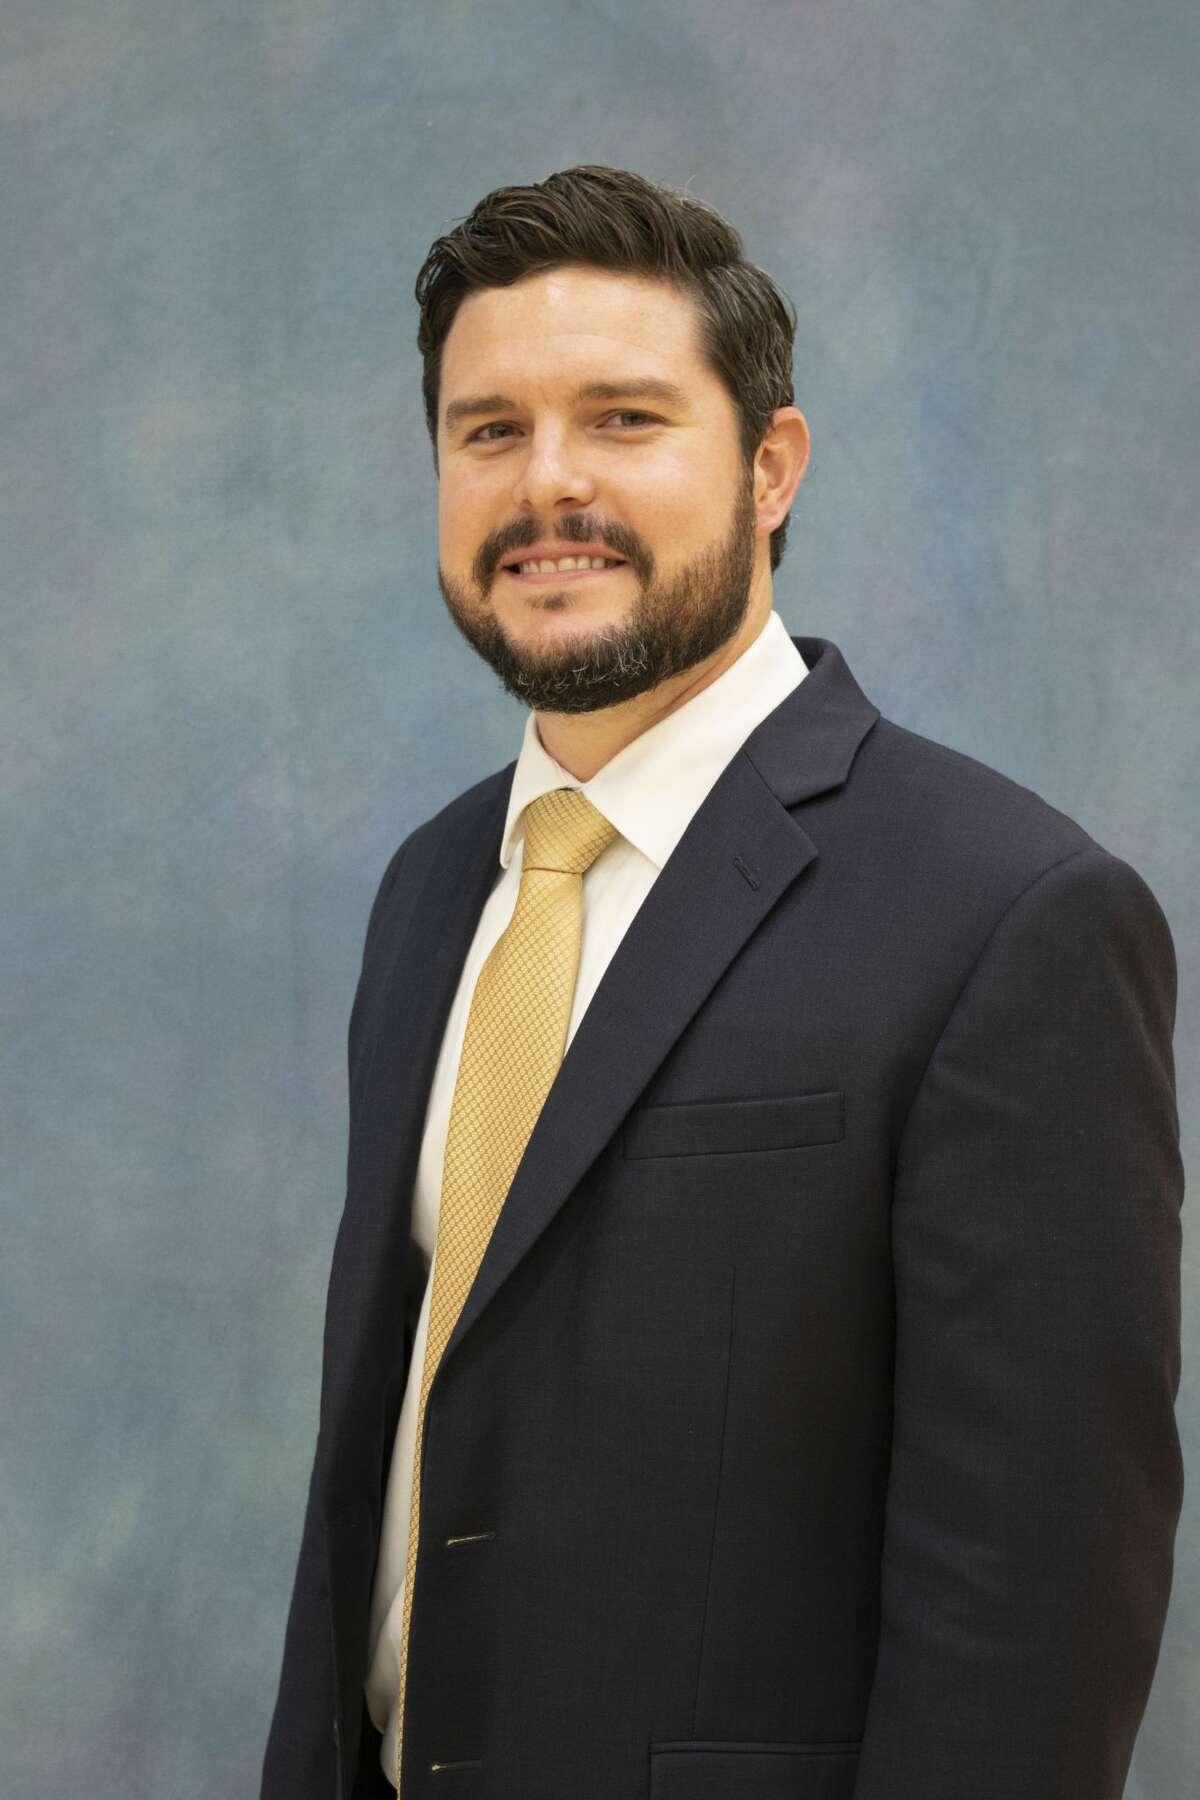 Landon Hughey